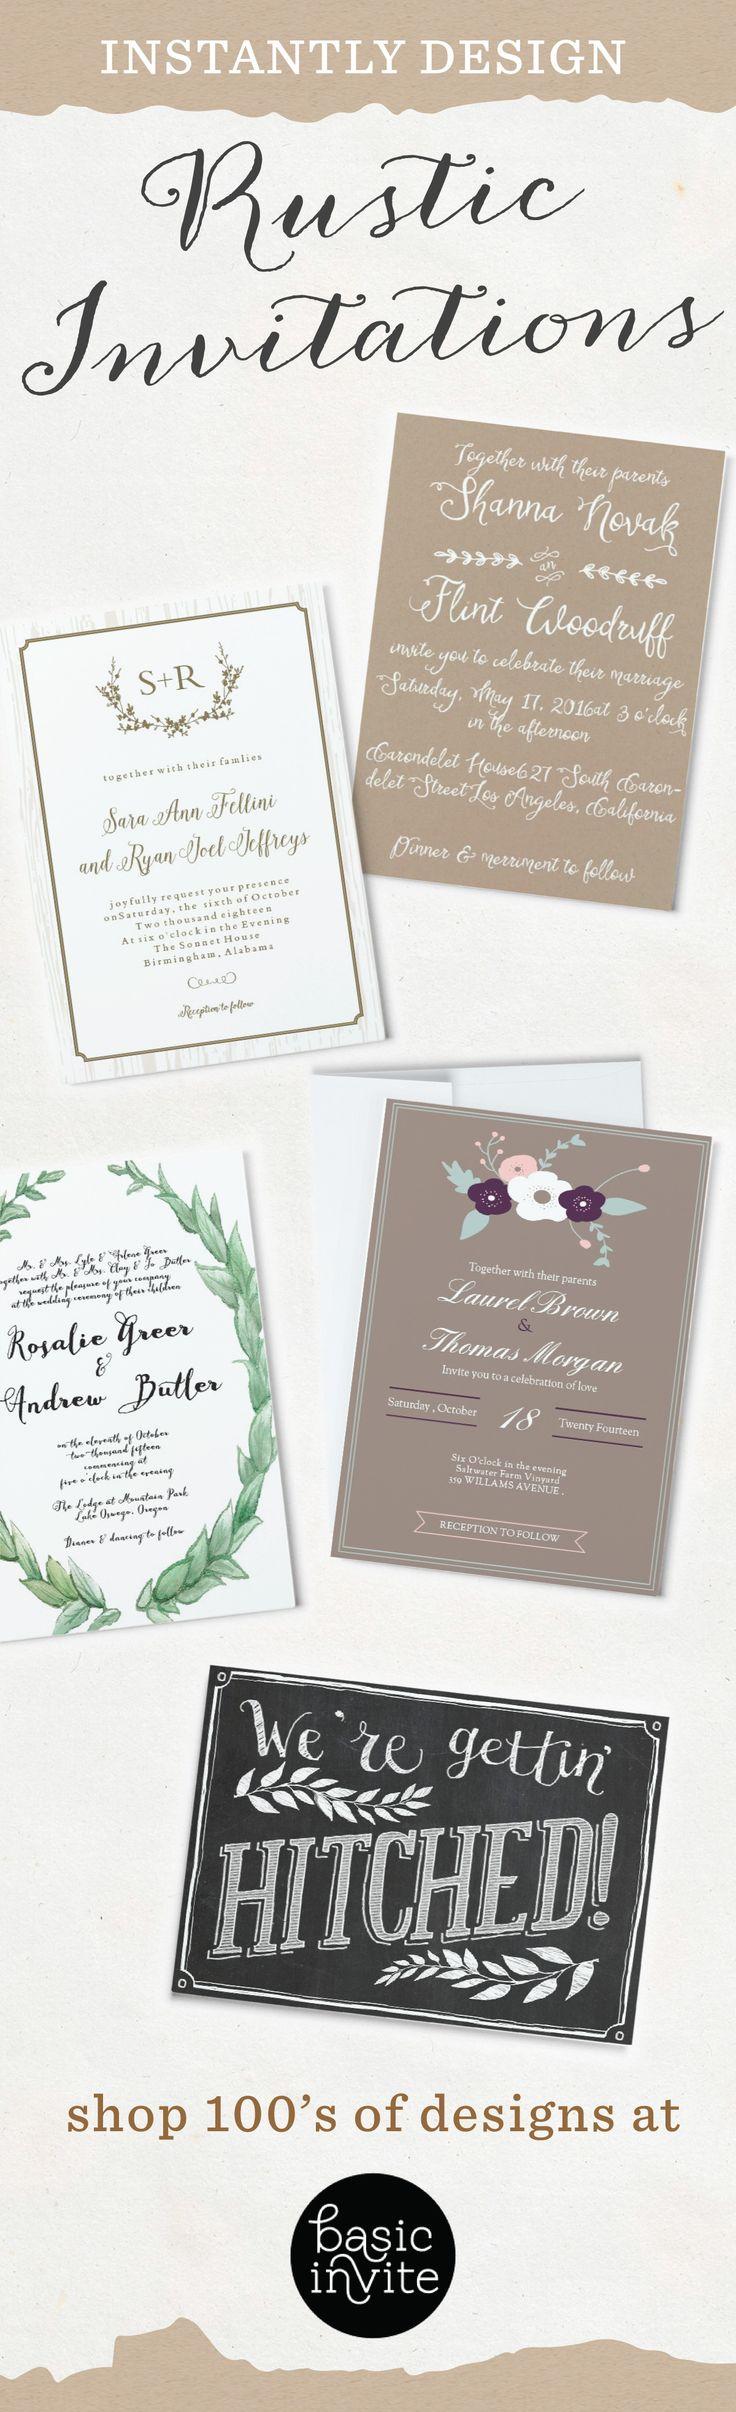 51 best Wedding Invitations images on Pinterest | Bridal invitations ...